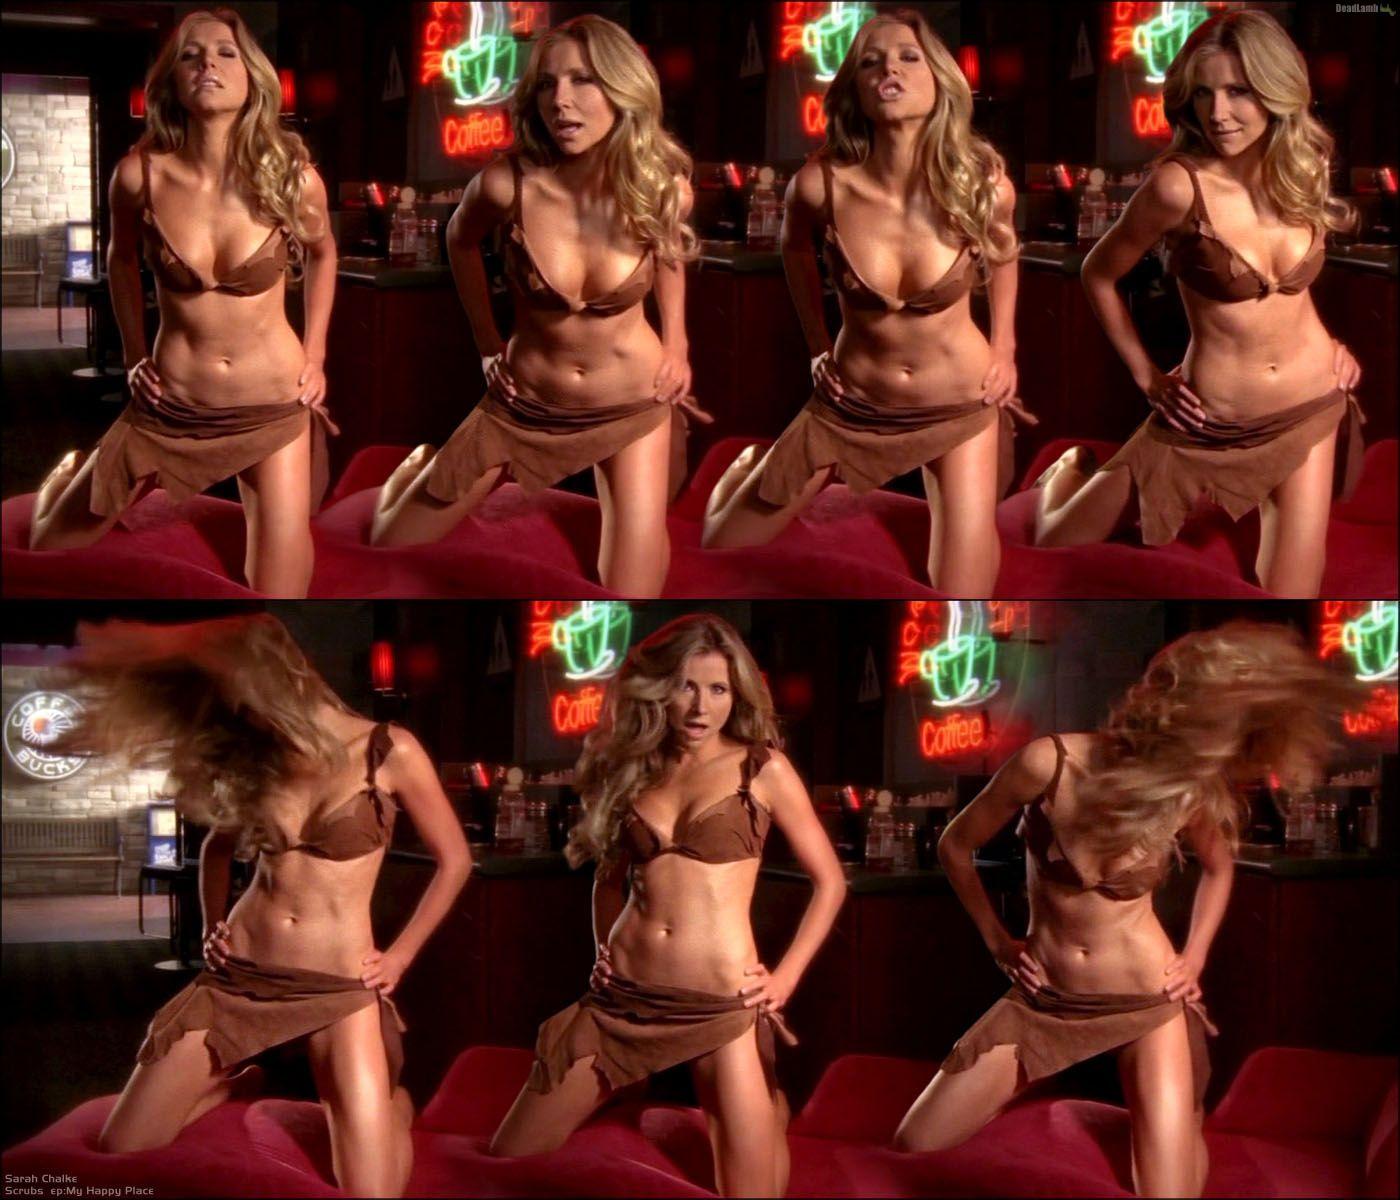 retro-sara-chalke-topless-gangbang-sexy